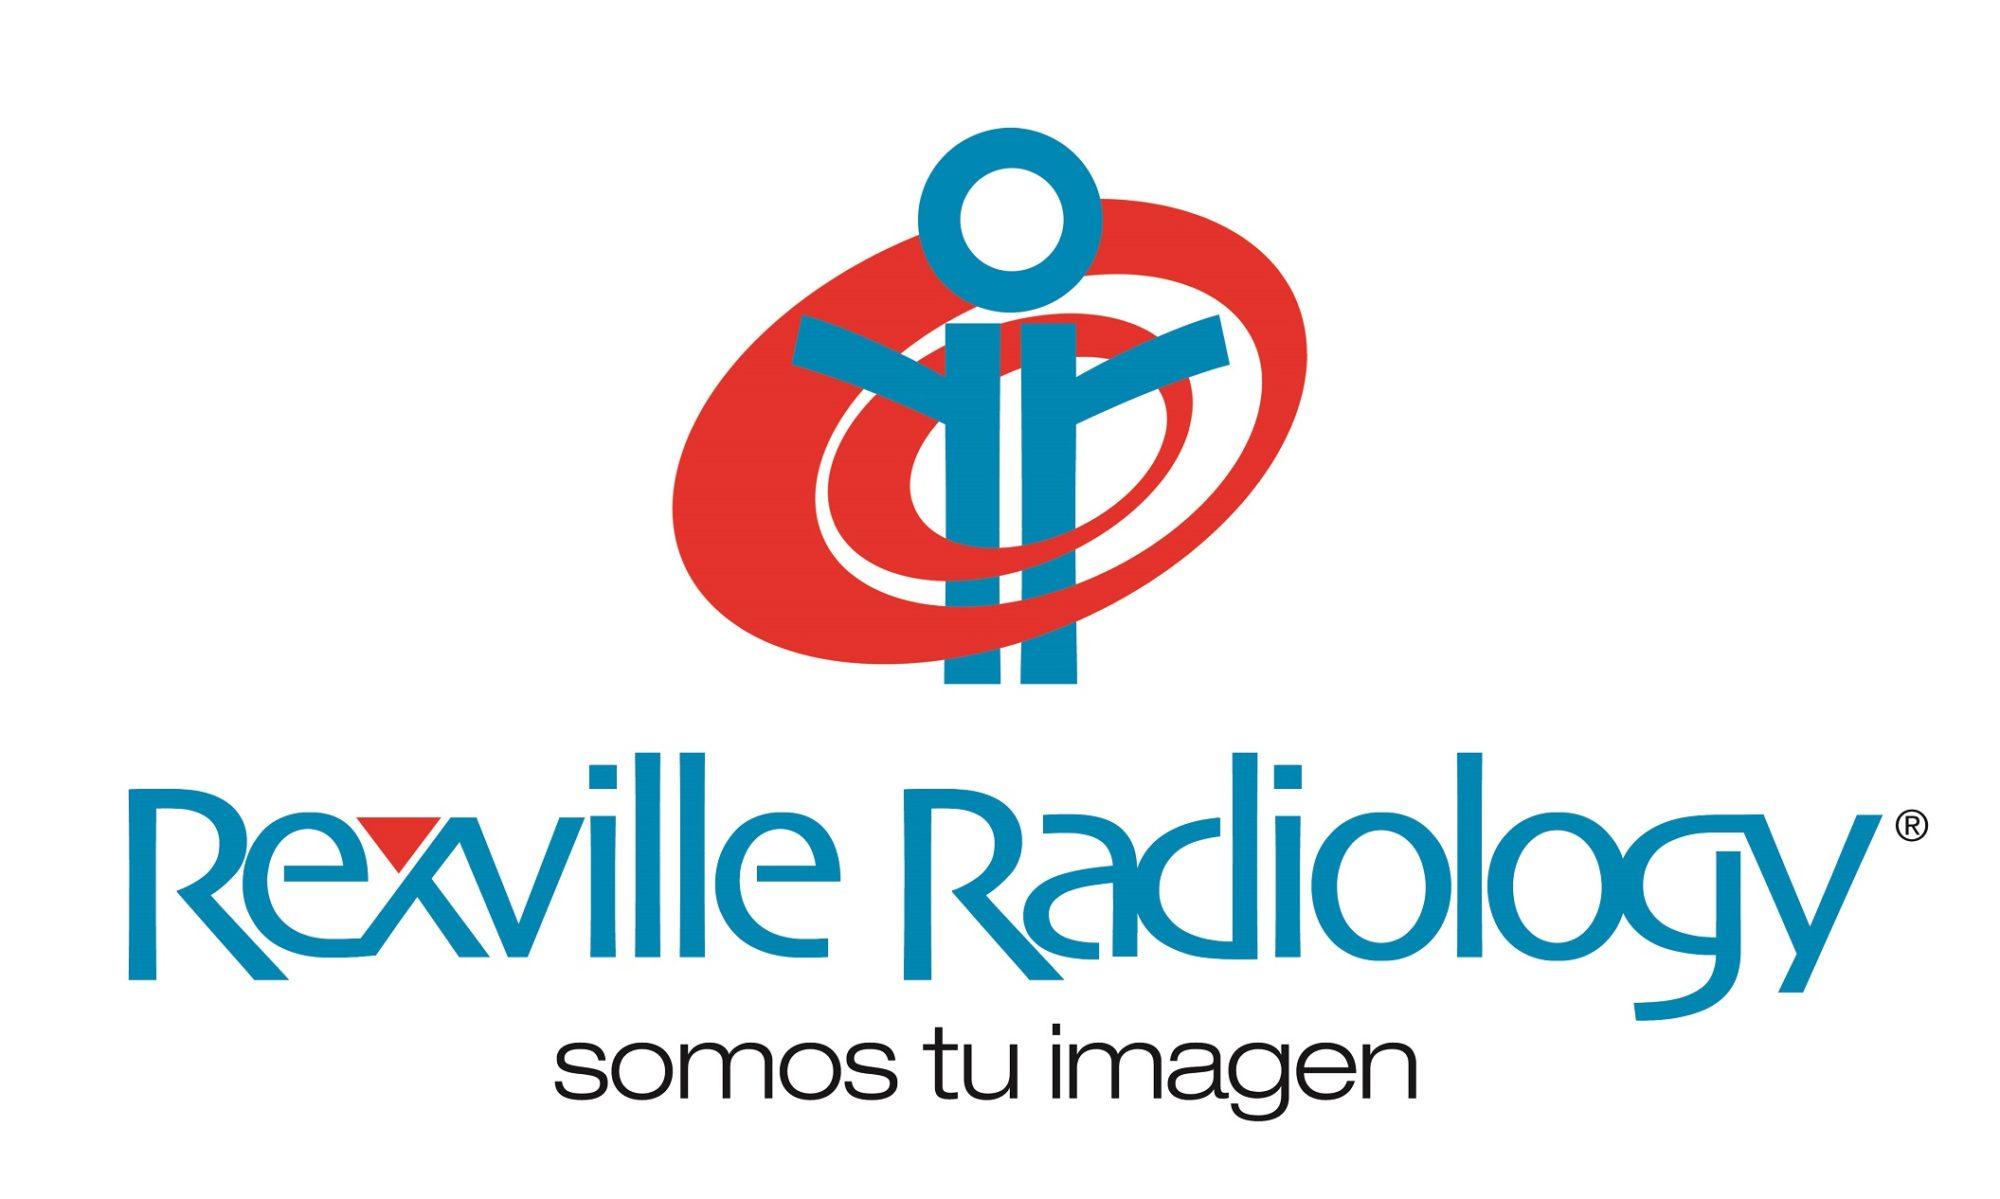 Rexville Radiology